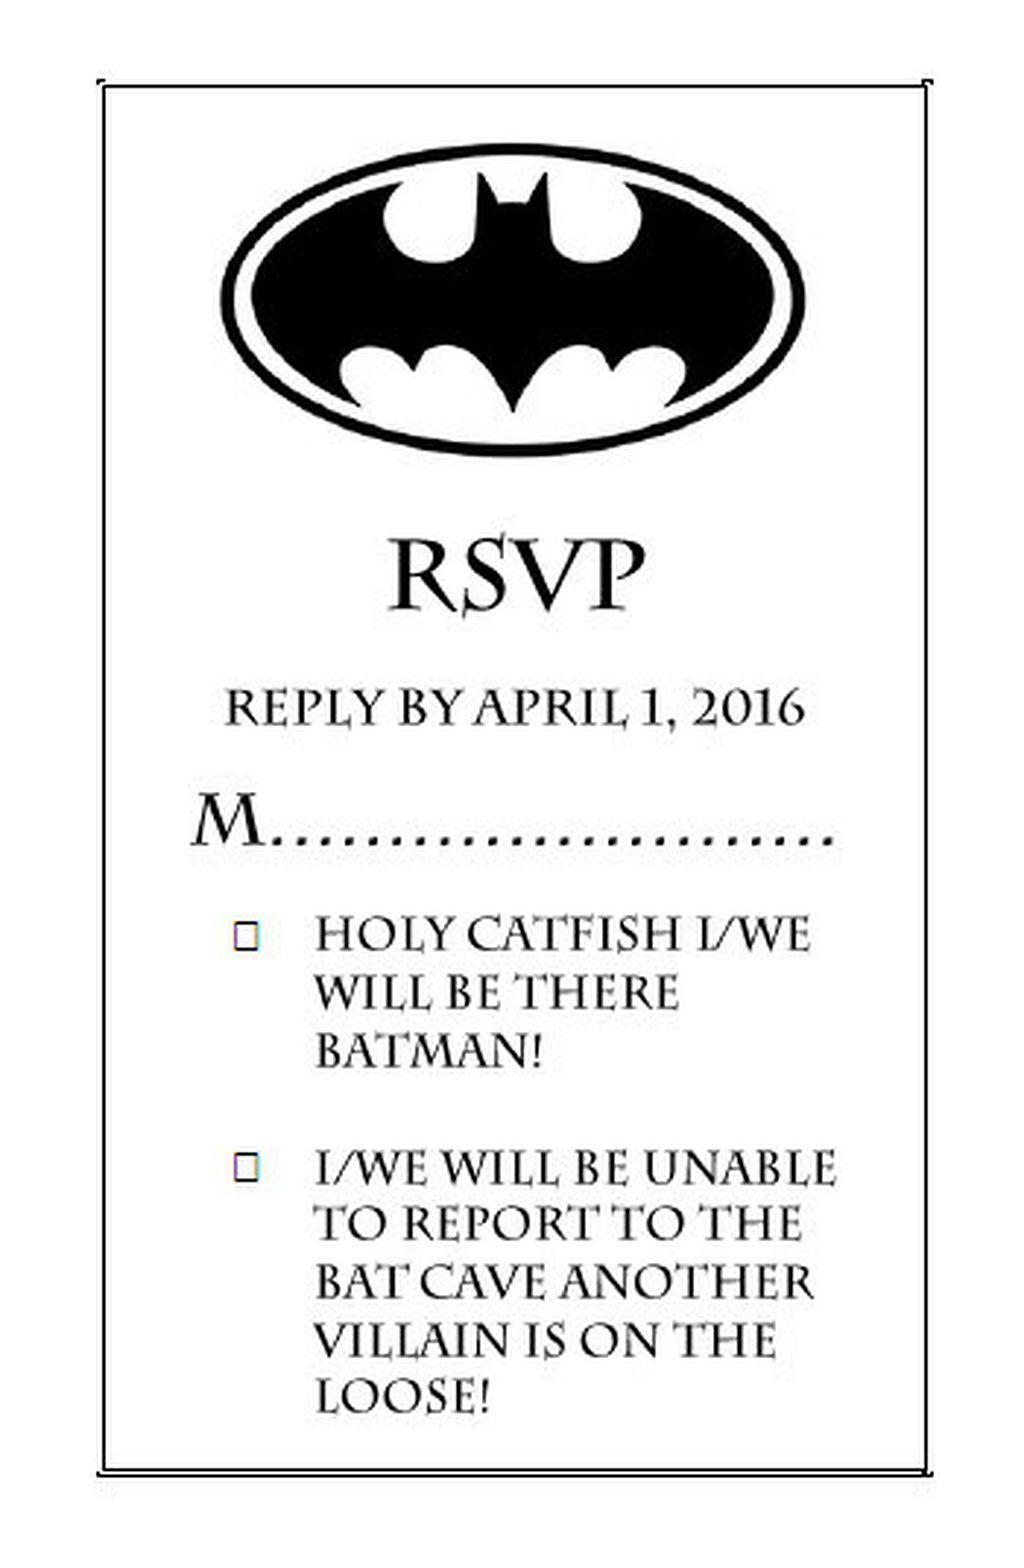 222 Superhero Themed Wedding Ideas | Themed weddings, Weddings and ...